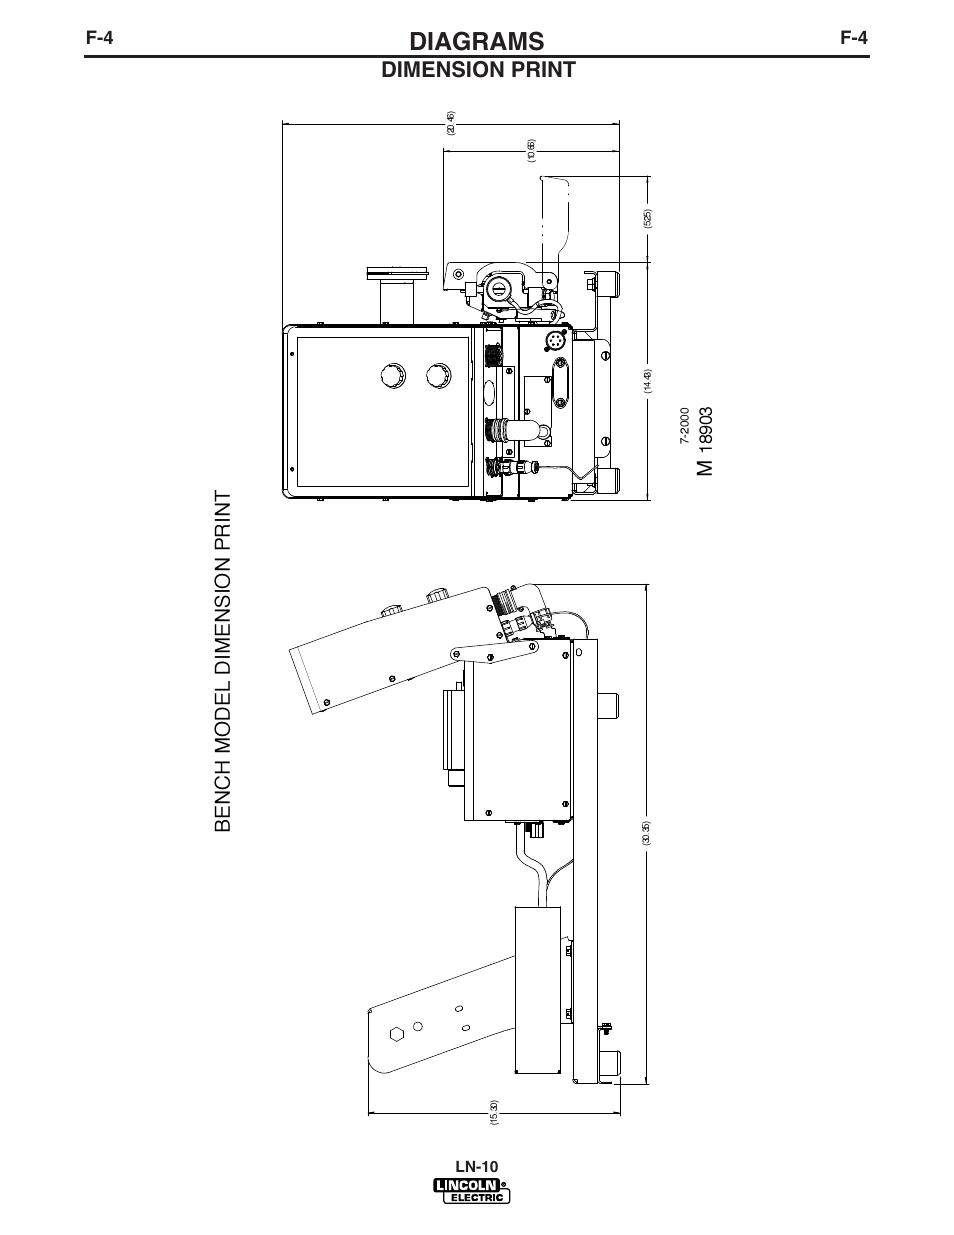 Diagrams  Dimension Print  Bench Model Dimension Print